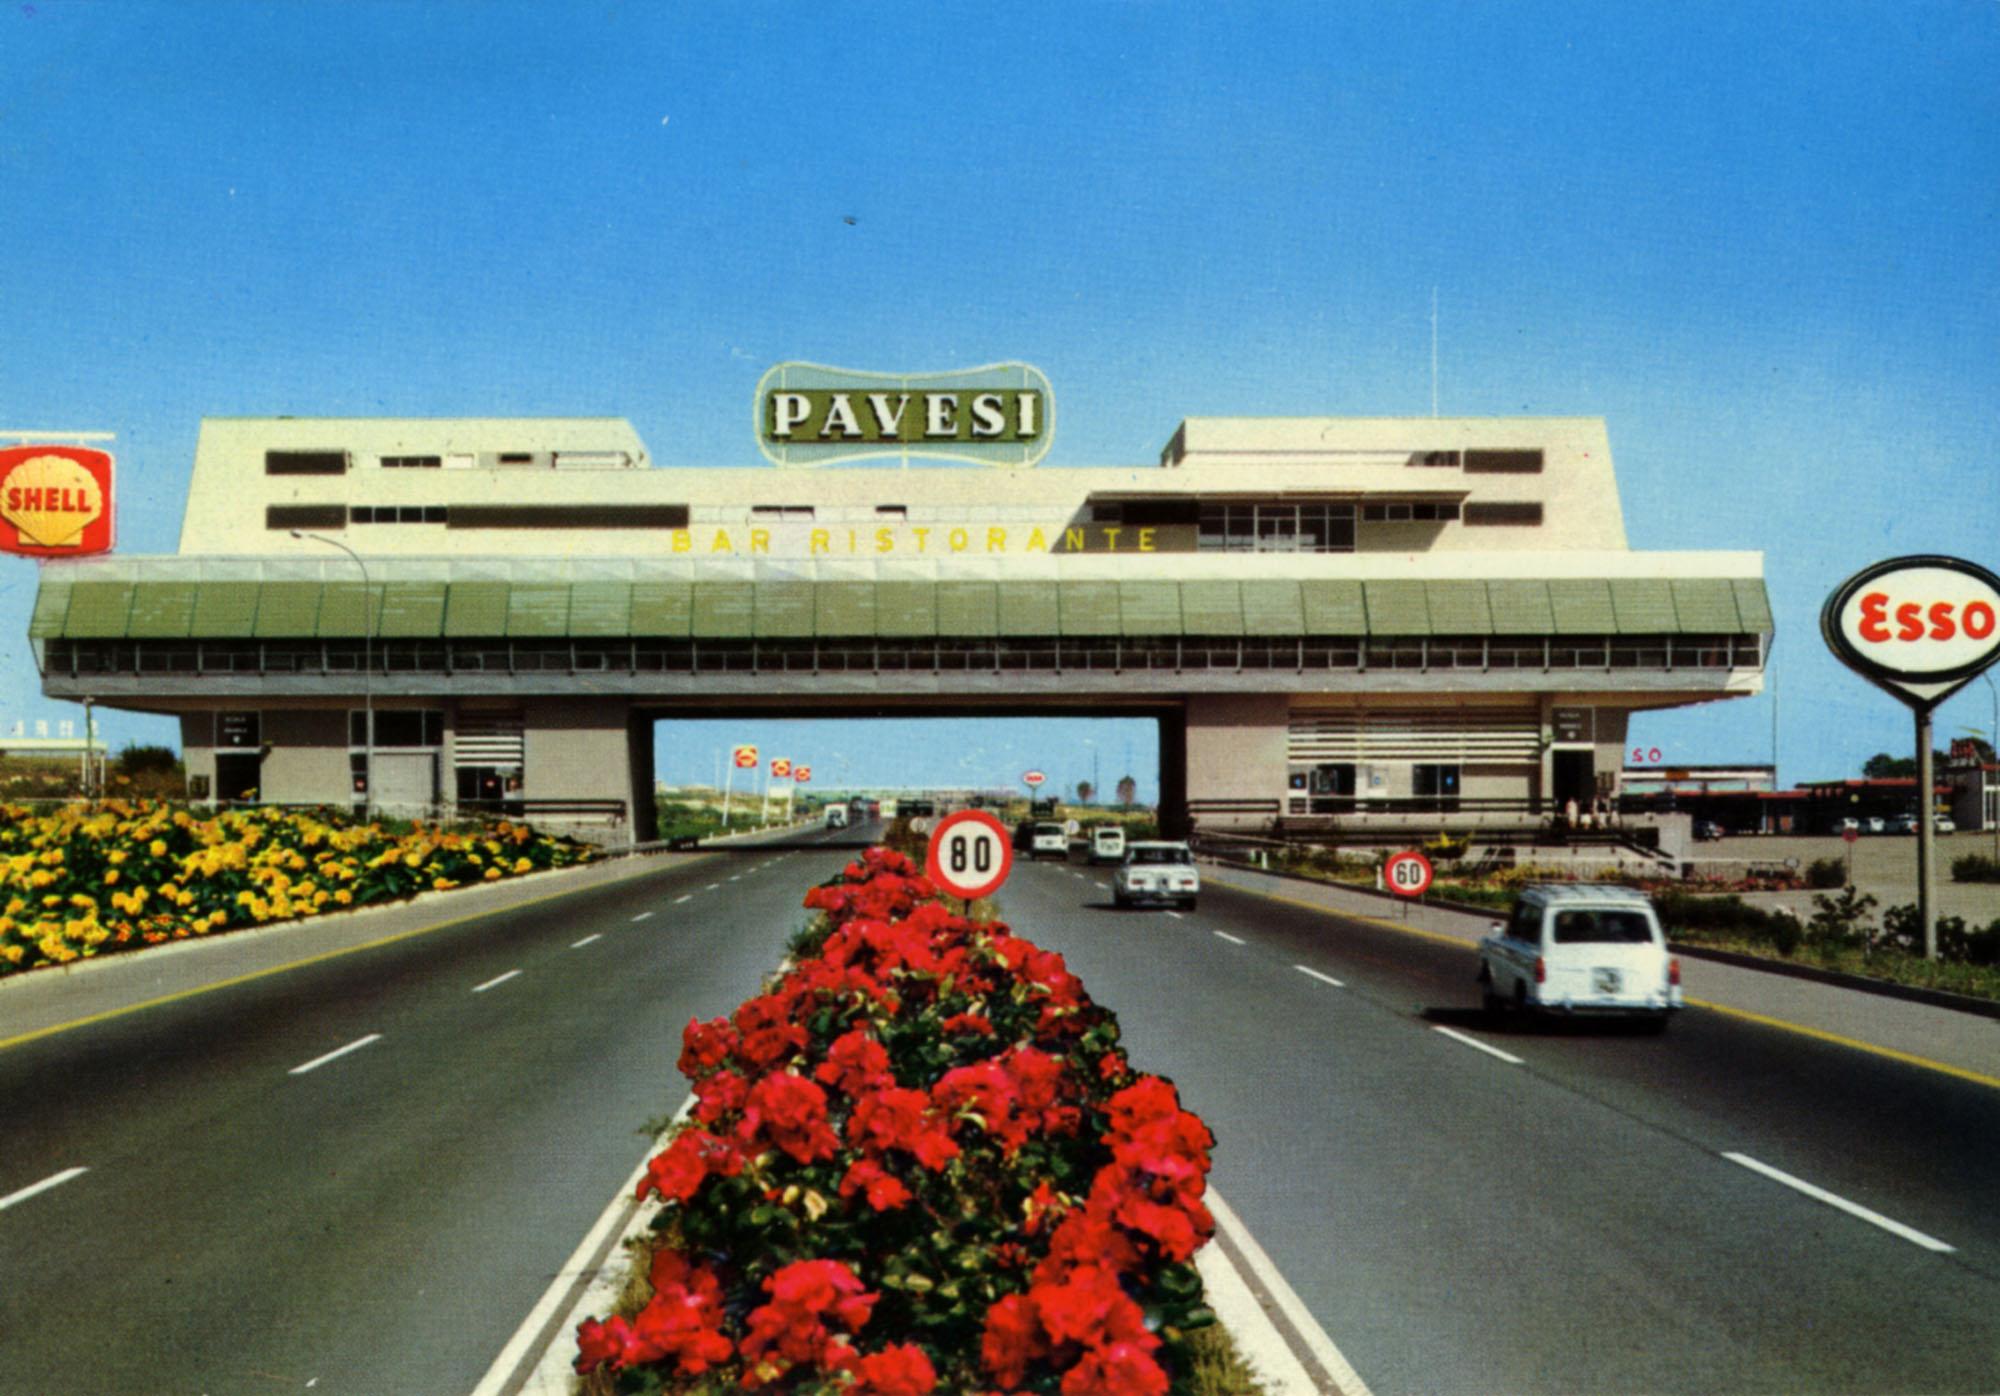 Pavesi Service Station postcard - Ferronia